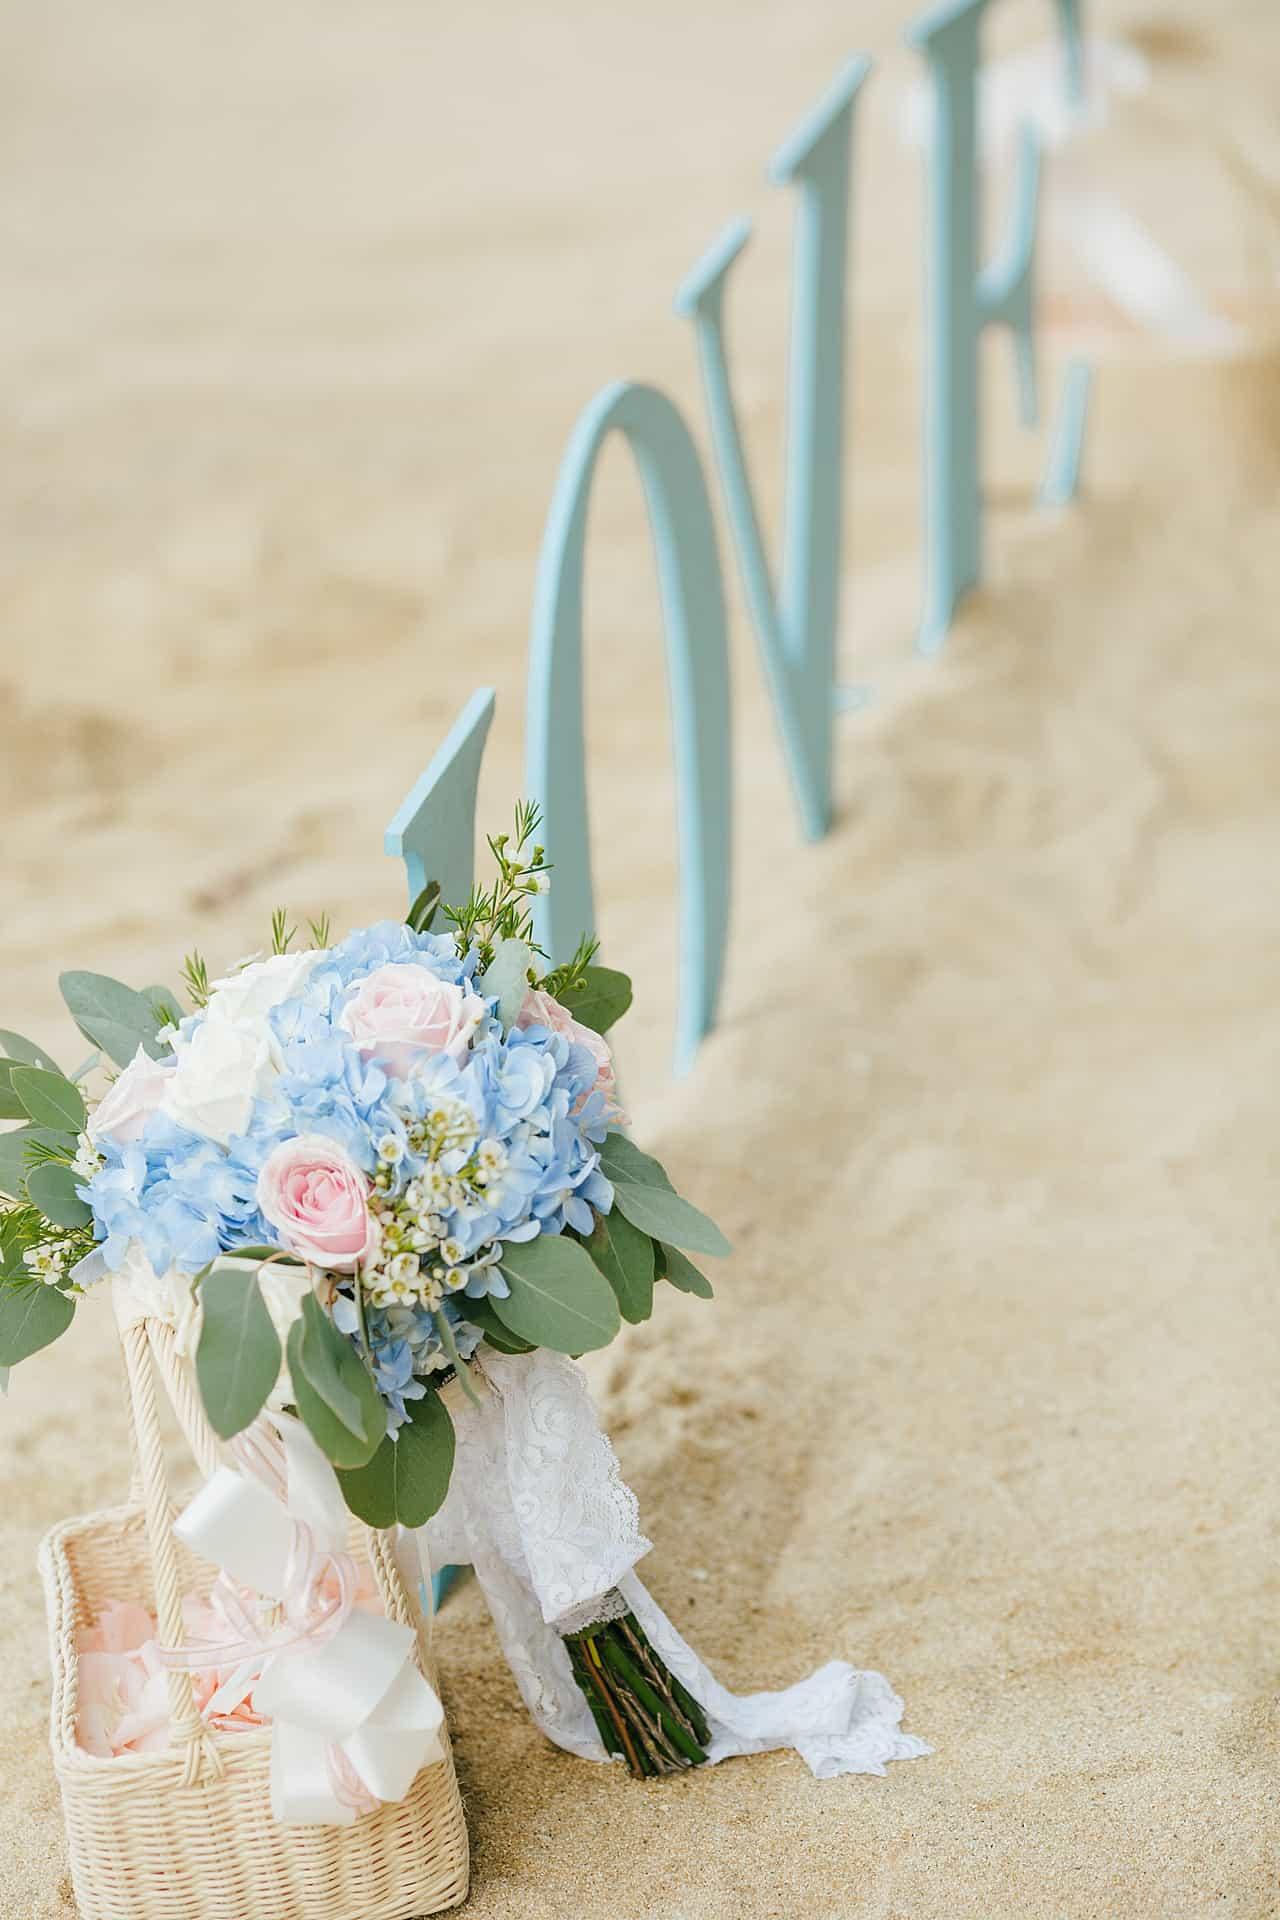 Wedding Haruka & Ronny, Hua Beach 8th September 2018 258